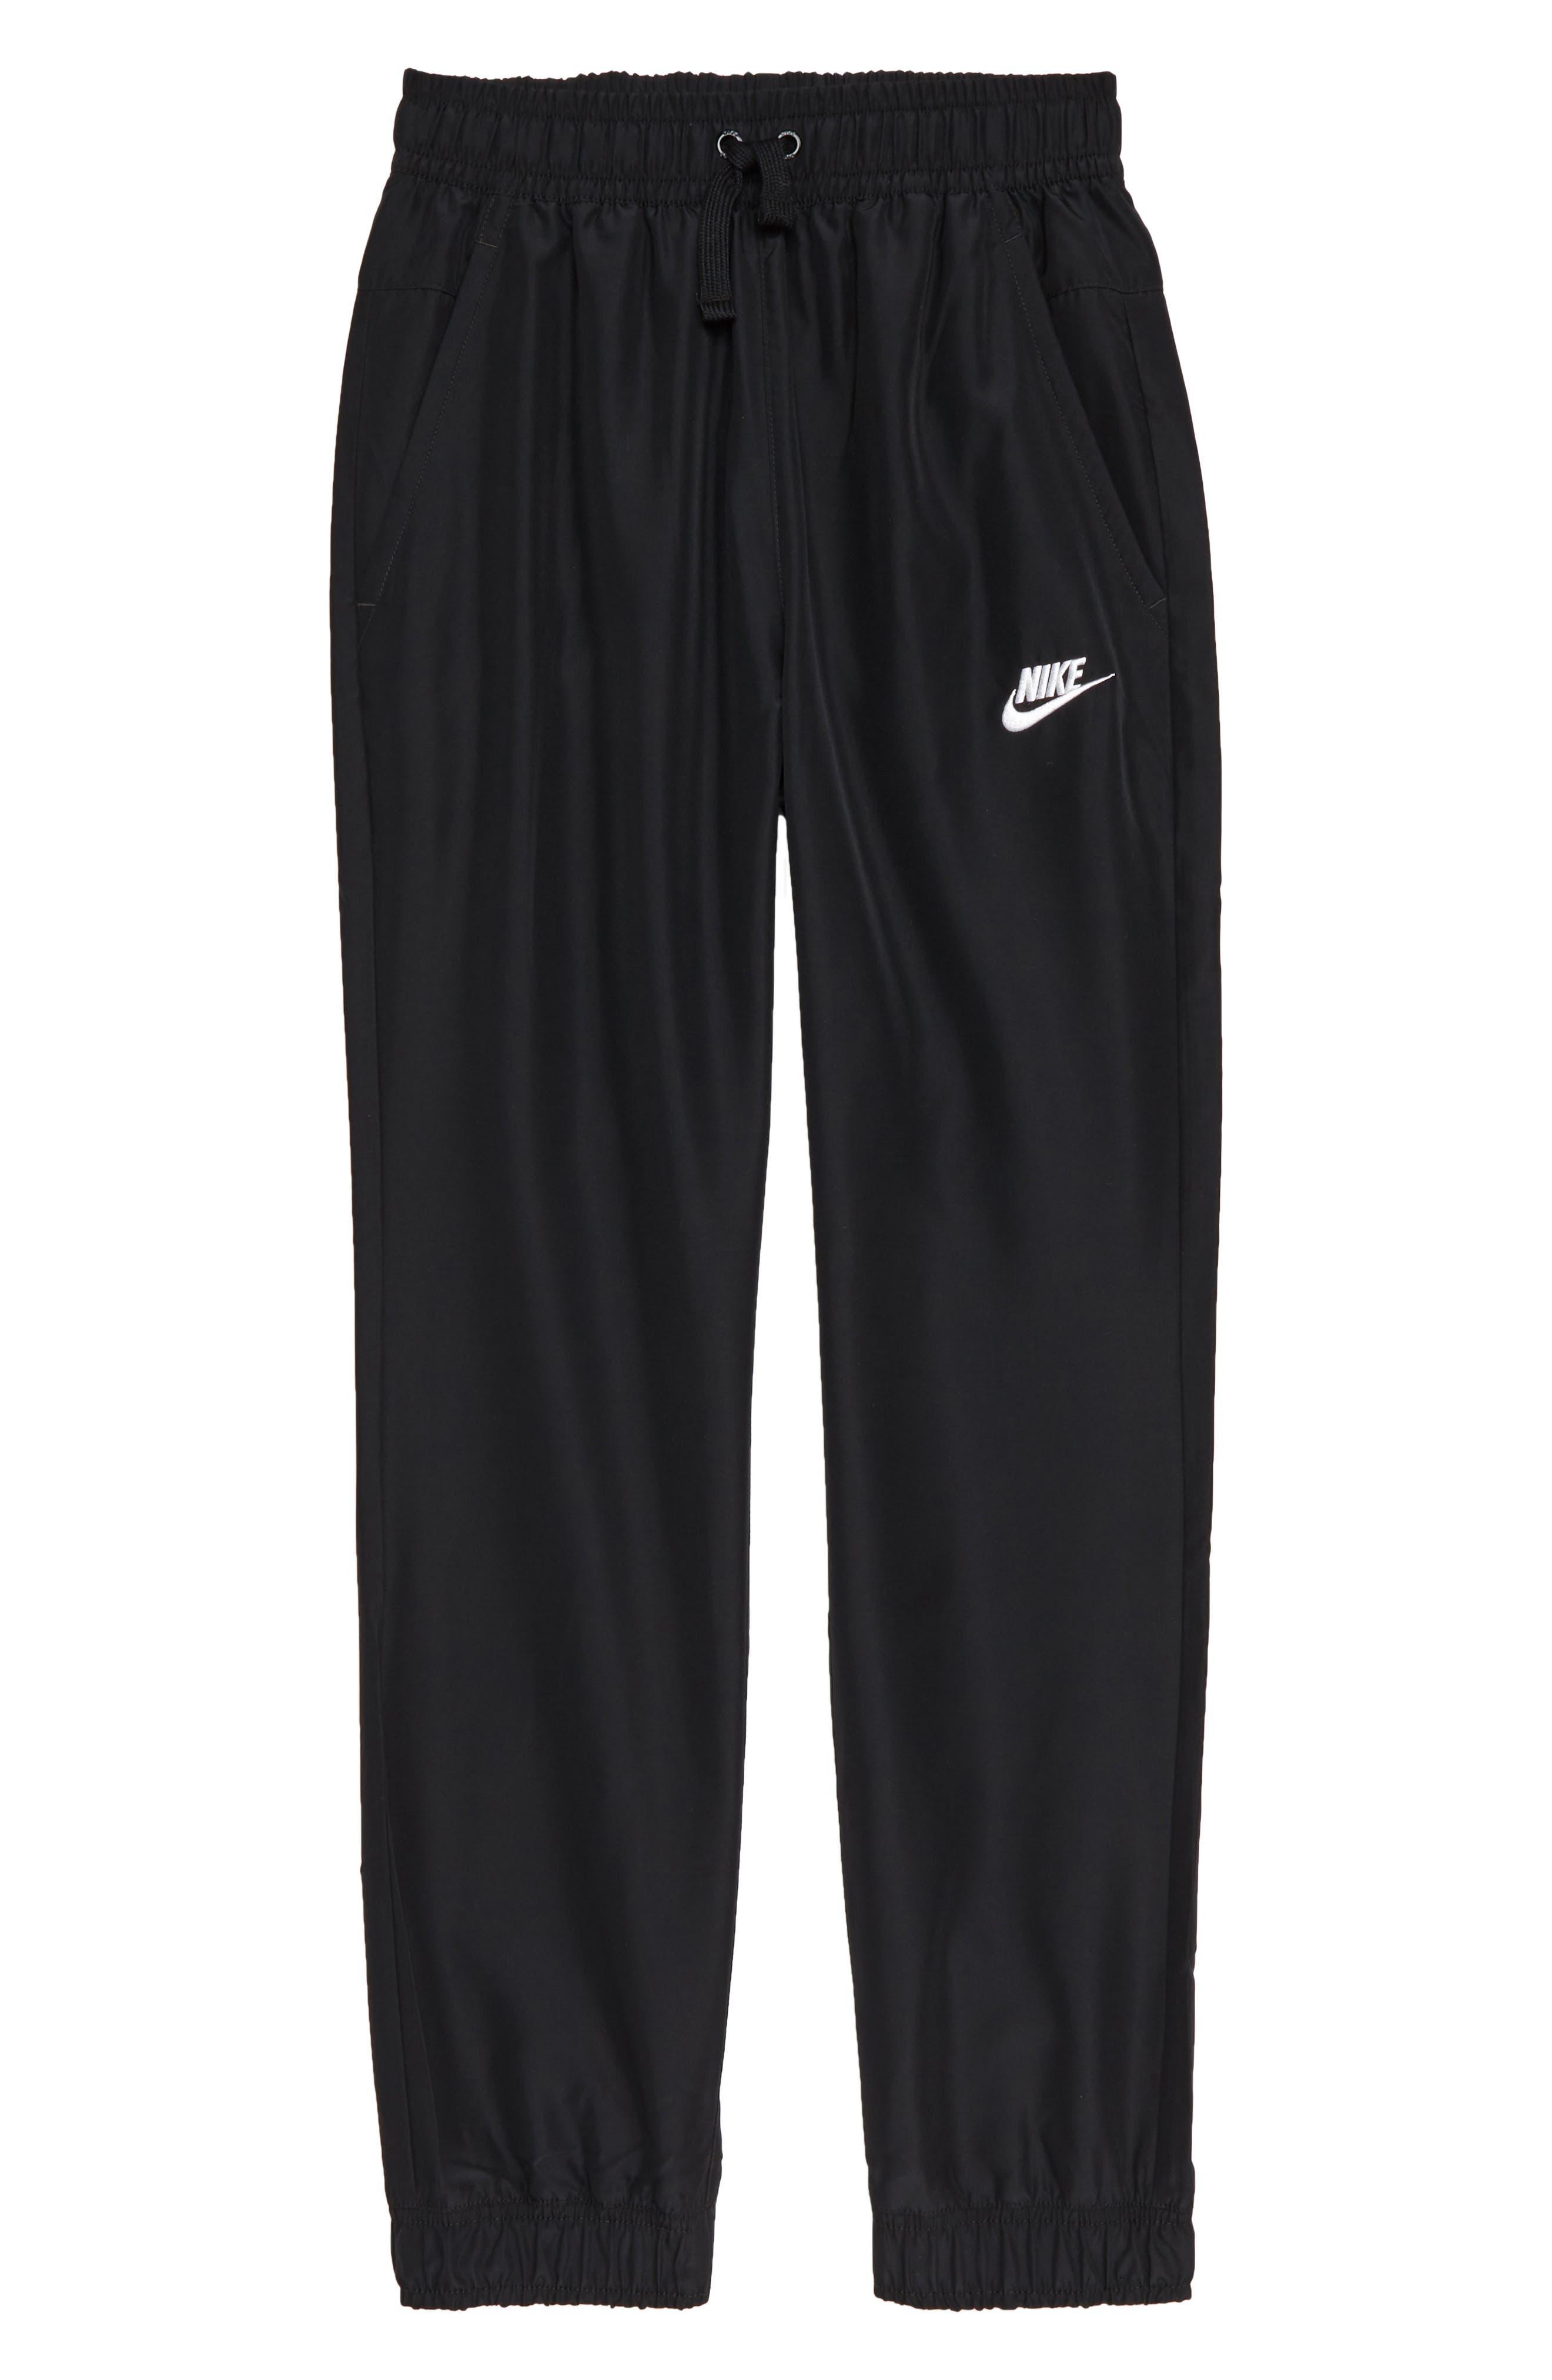 NIKE Sportswear Woven Jogger Pants, Main, color, 010